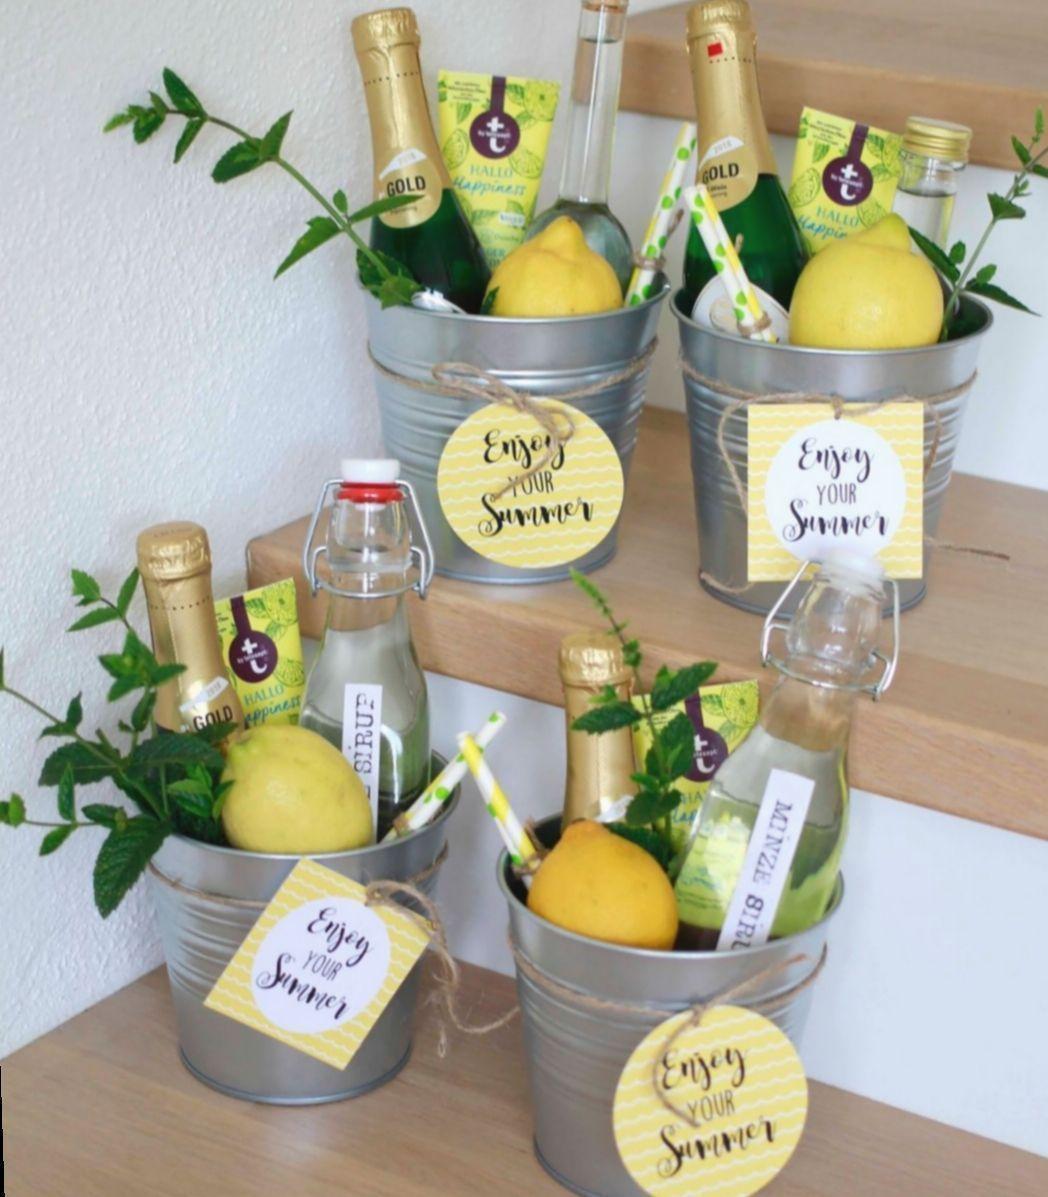 17 Diy Gifts Birthday Colleague #Gift Basket Ideas 17 Diy Gifts Birth   #B,#basket #birth #birthday #colleague,#basket #birth #birthday #colleague #gifts #ideas